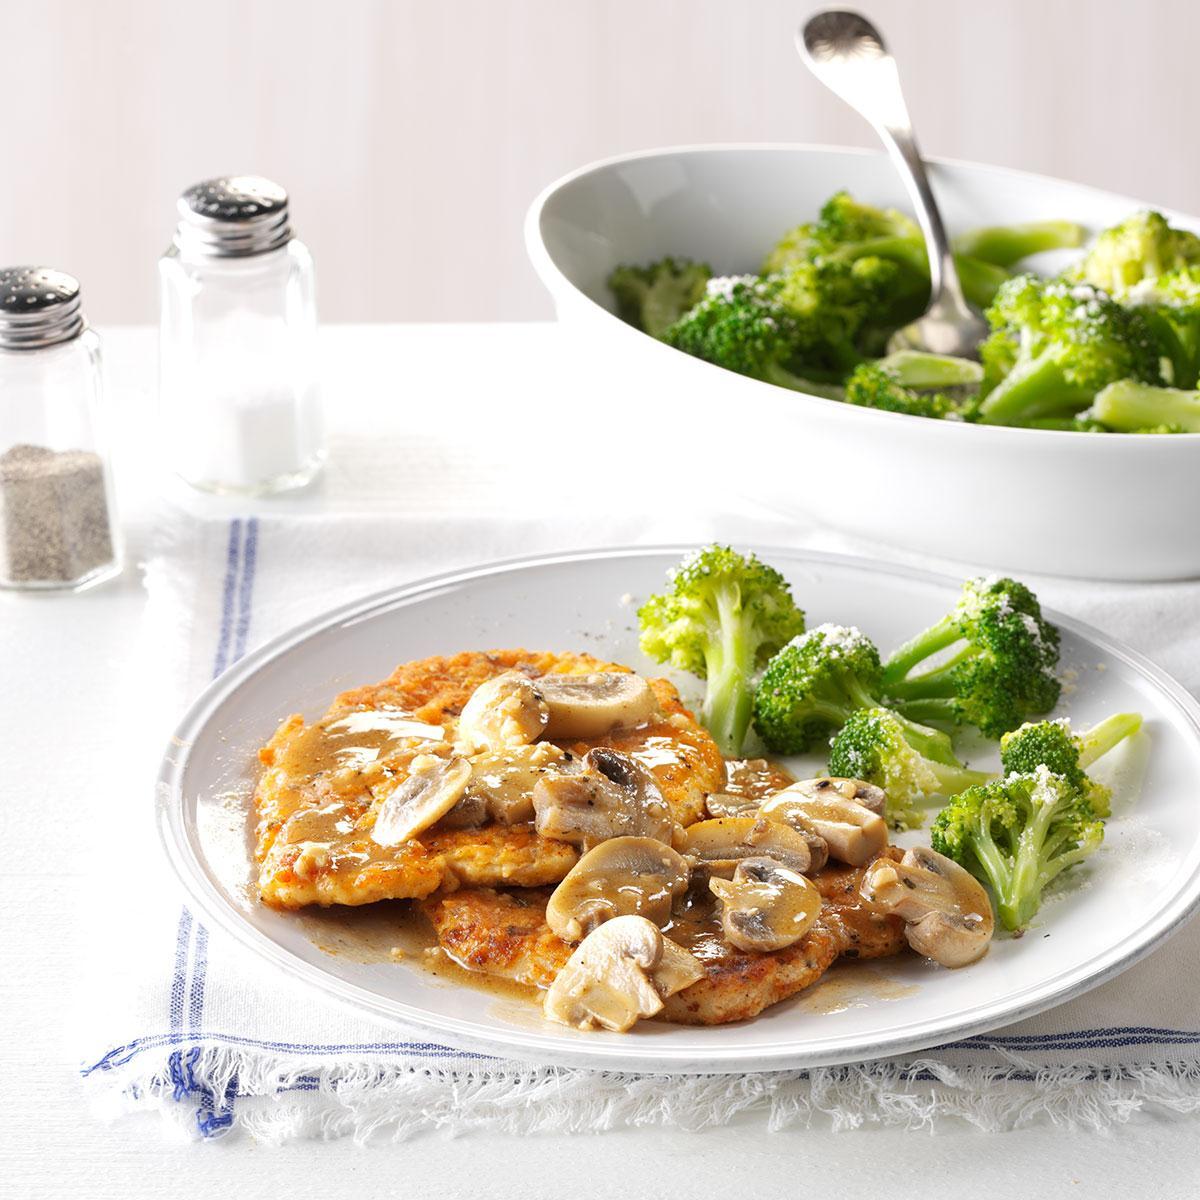 Garlic-Mushroom Turkey Slices Recipe | Taste of Home